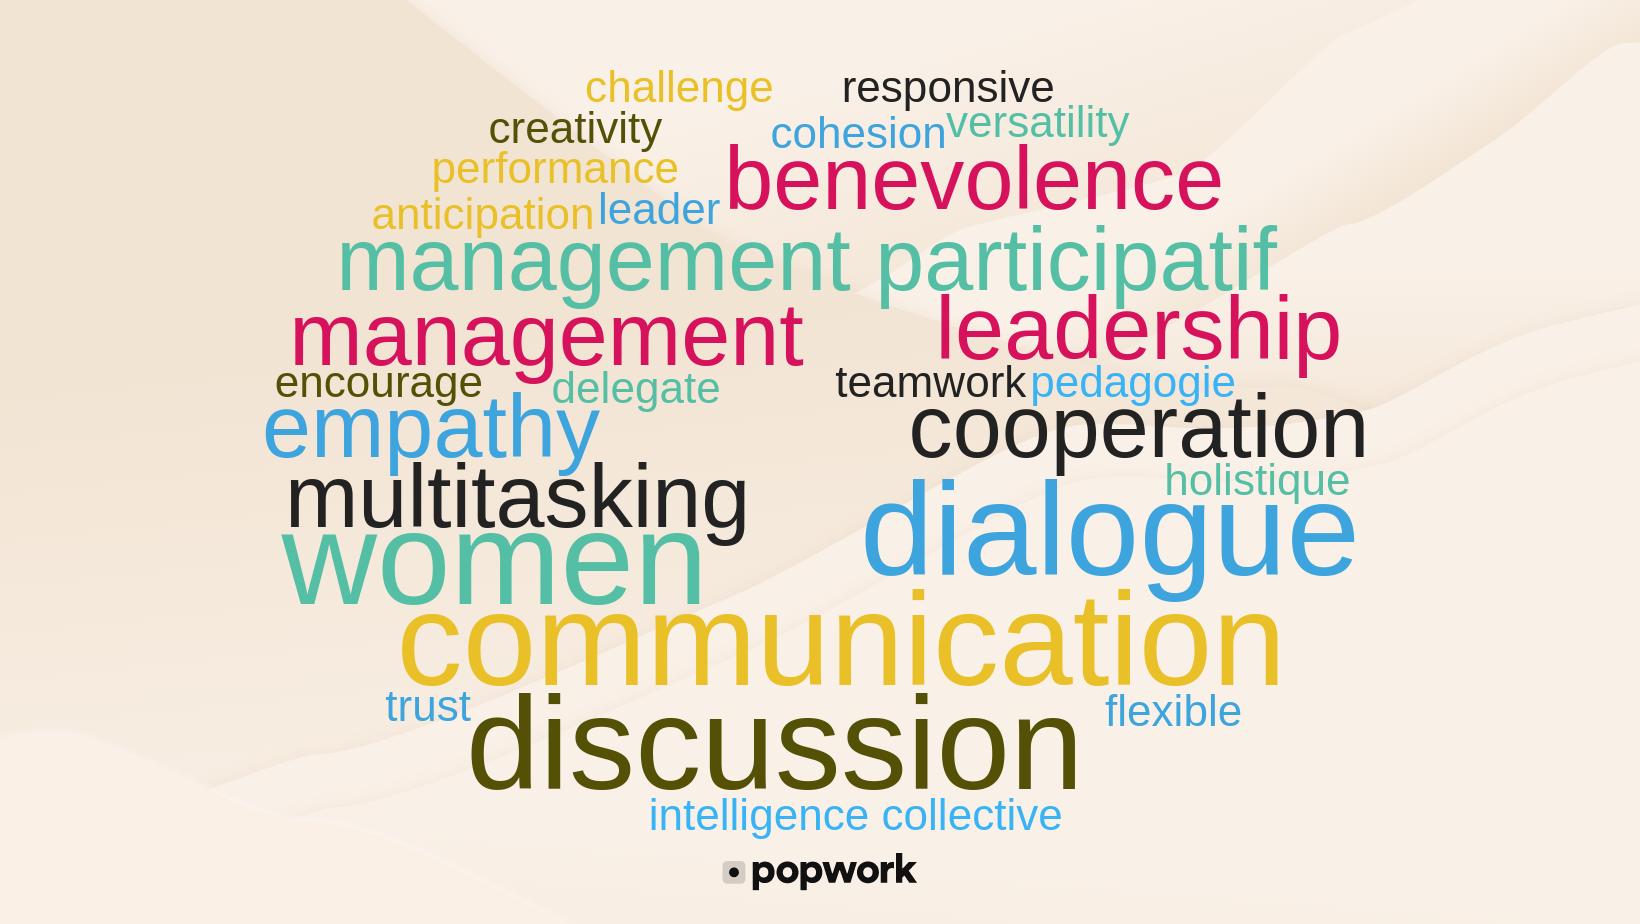 "Word cloud of female leadership: ""women"" ""empathy"" ""management"" ""multitasking"" ""flexible"" ""responsive"" ""versatility"" ""communication"" ""encouraging"" ""teamwork"" ""discussion"" ""participative"" ""leadership"" ""trust"" ""pedagogy"" ""dialogue"" ""anticipation"" ""cohesion"" ""cooperation"" ""collective"" ""intelligence"" ""benevolence"" ""creativity"" ""performance"" ""delegate"" ""challenge"" ""holistic"" ""leadership"" - Popwork"